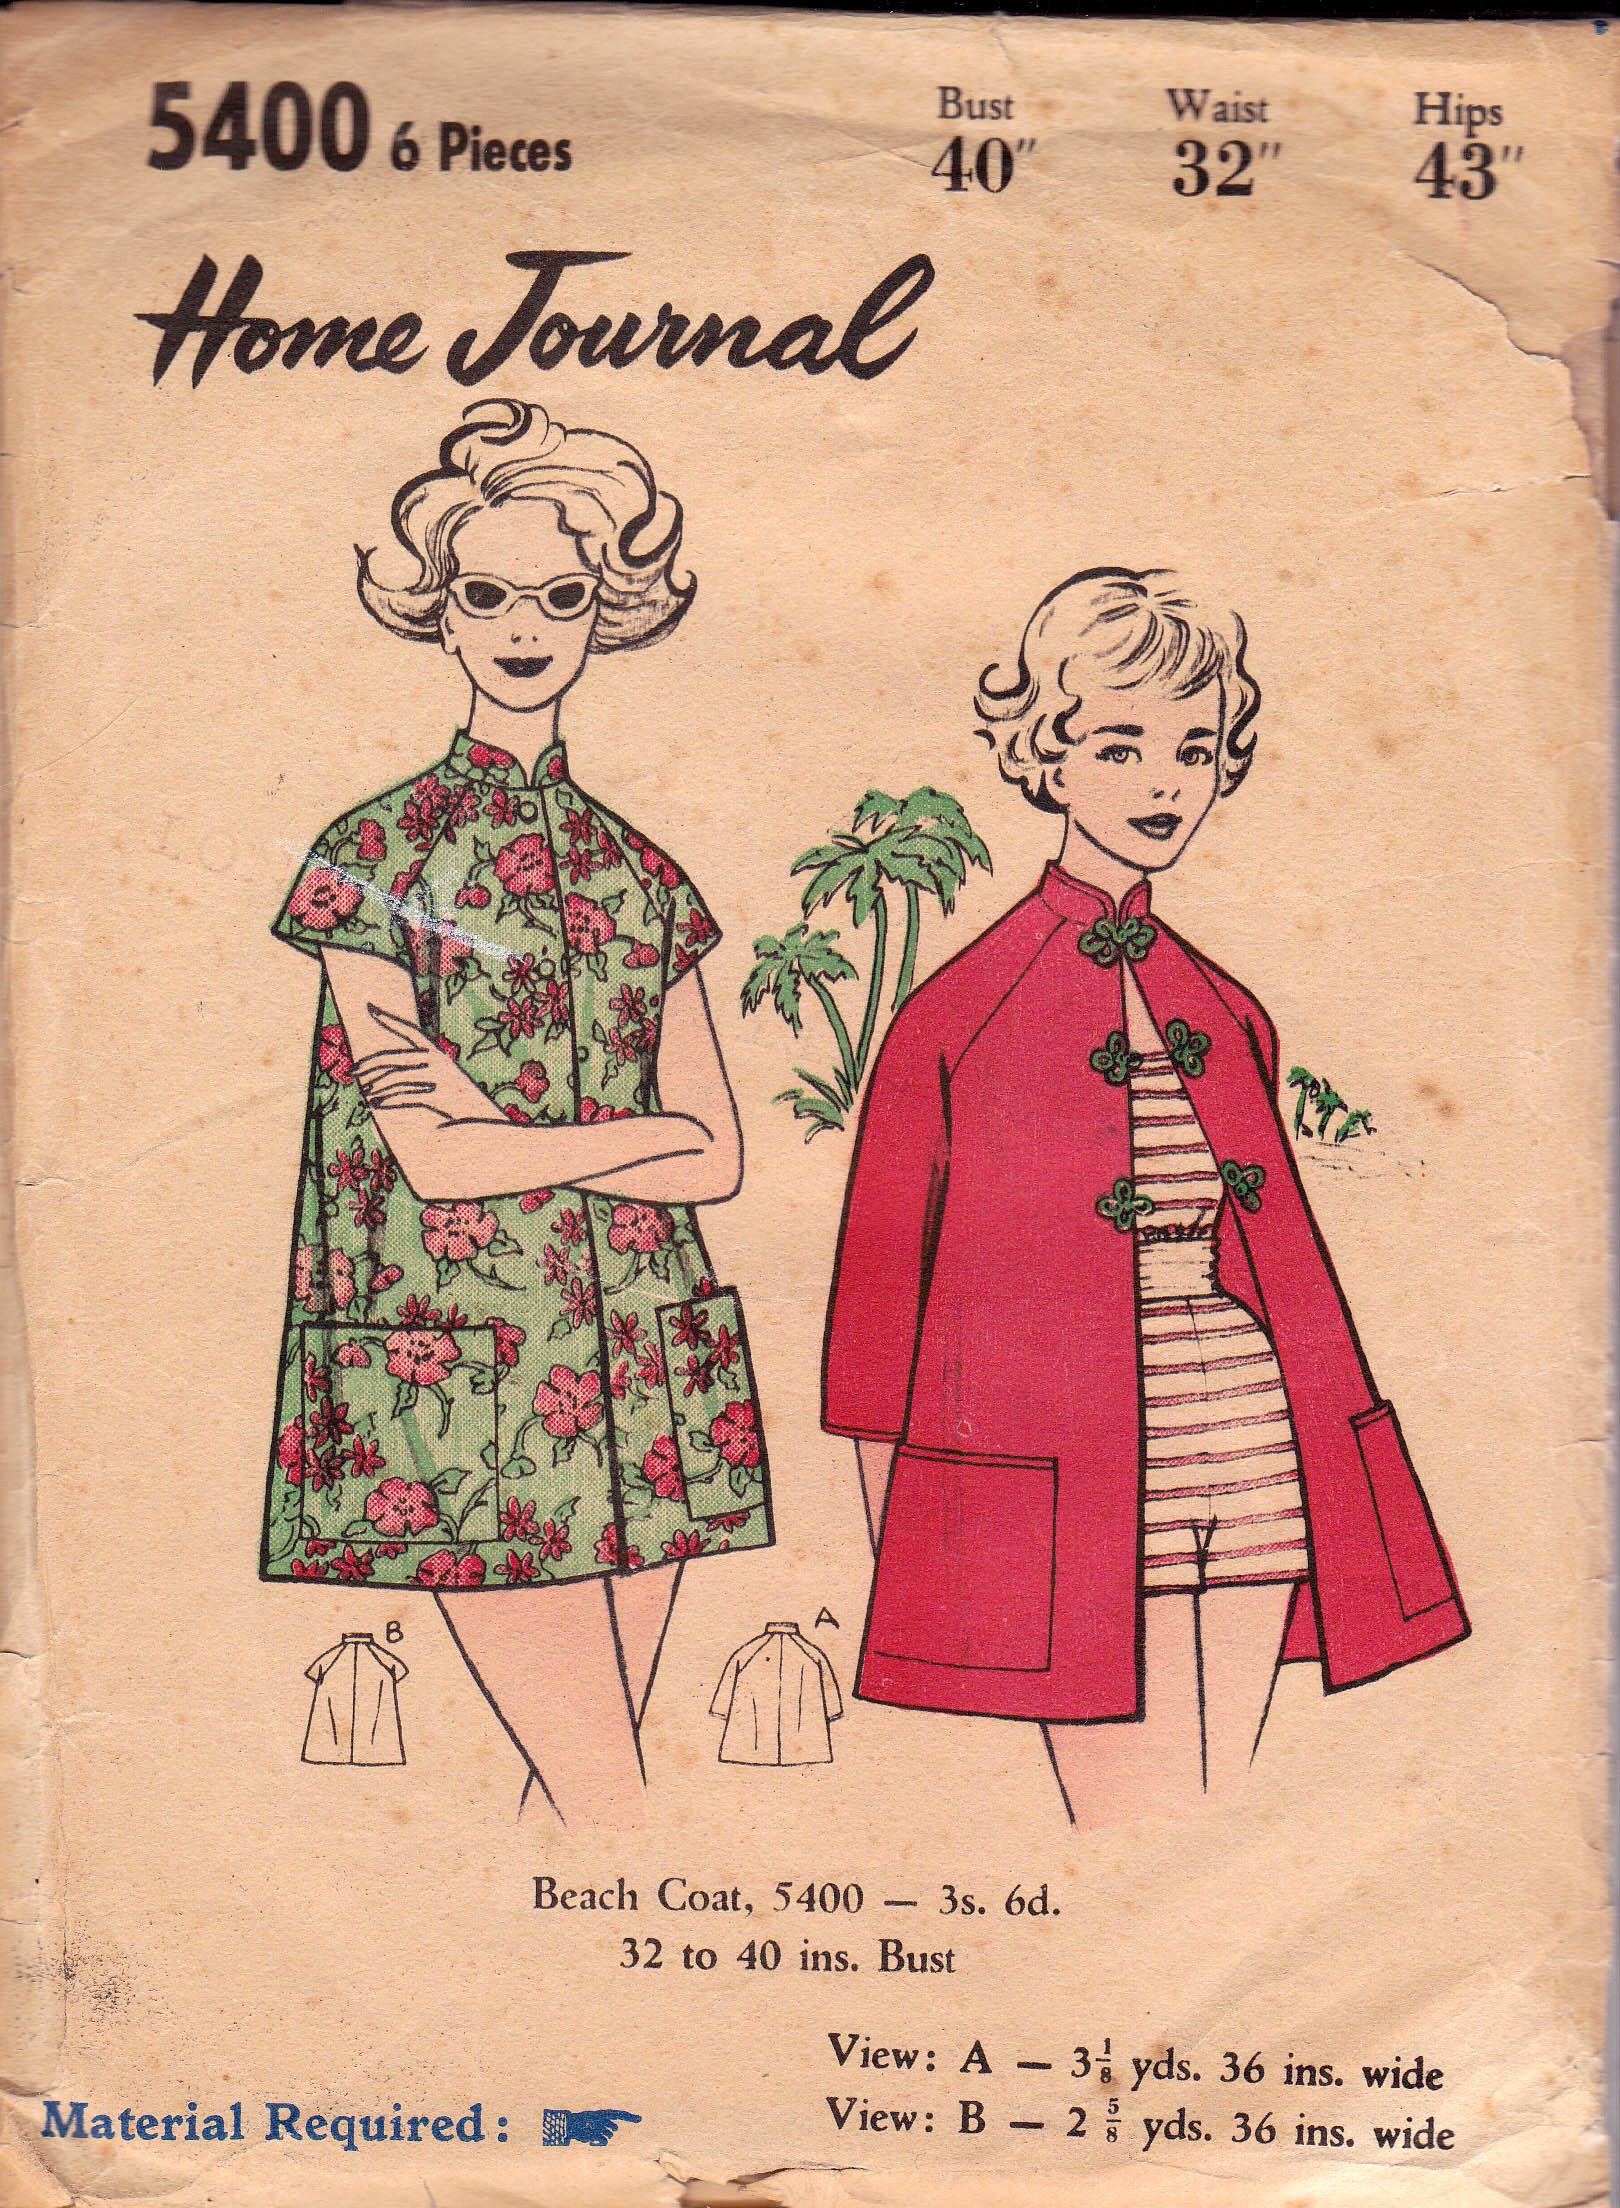 Australian Home Journal 5400